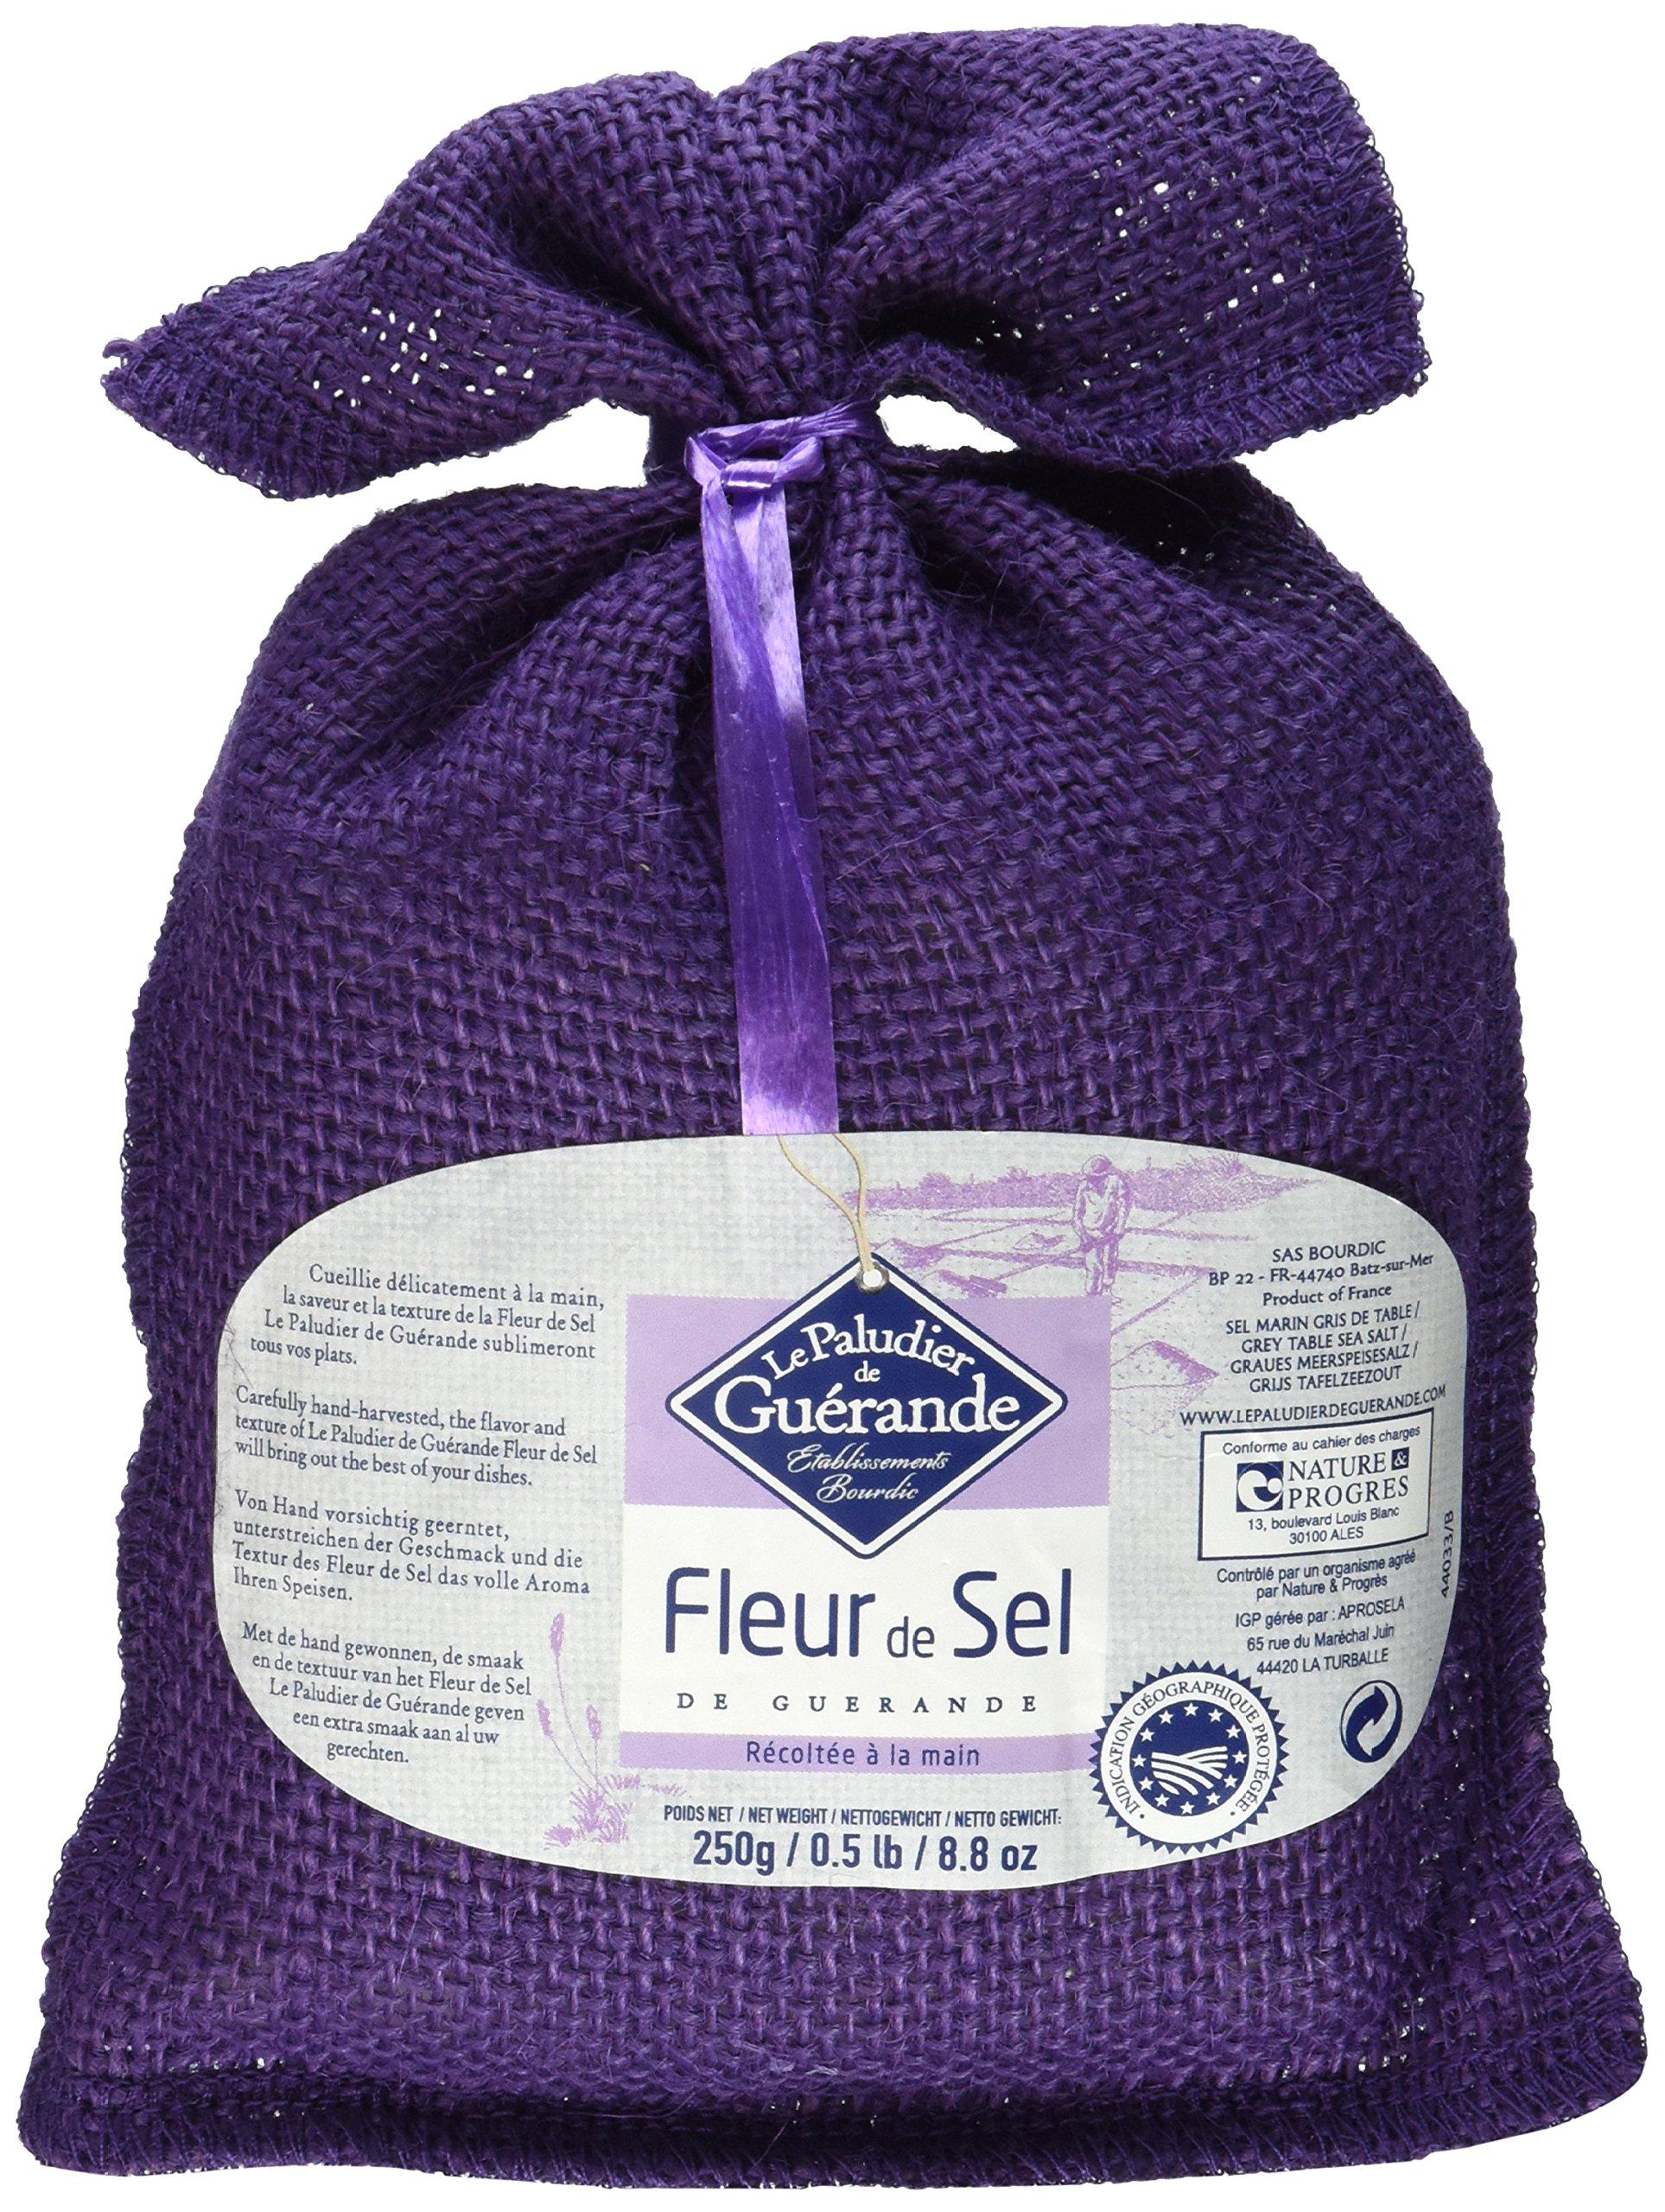 Fleur de Sel de Guerande Sea Salt - 8.8 oz